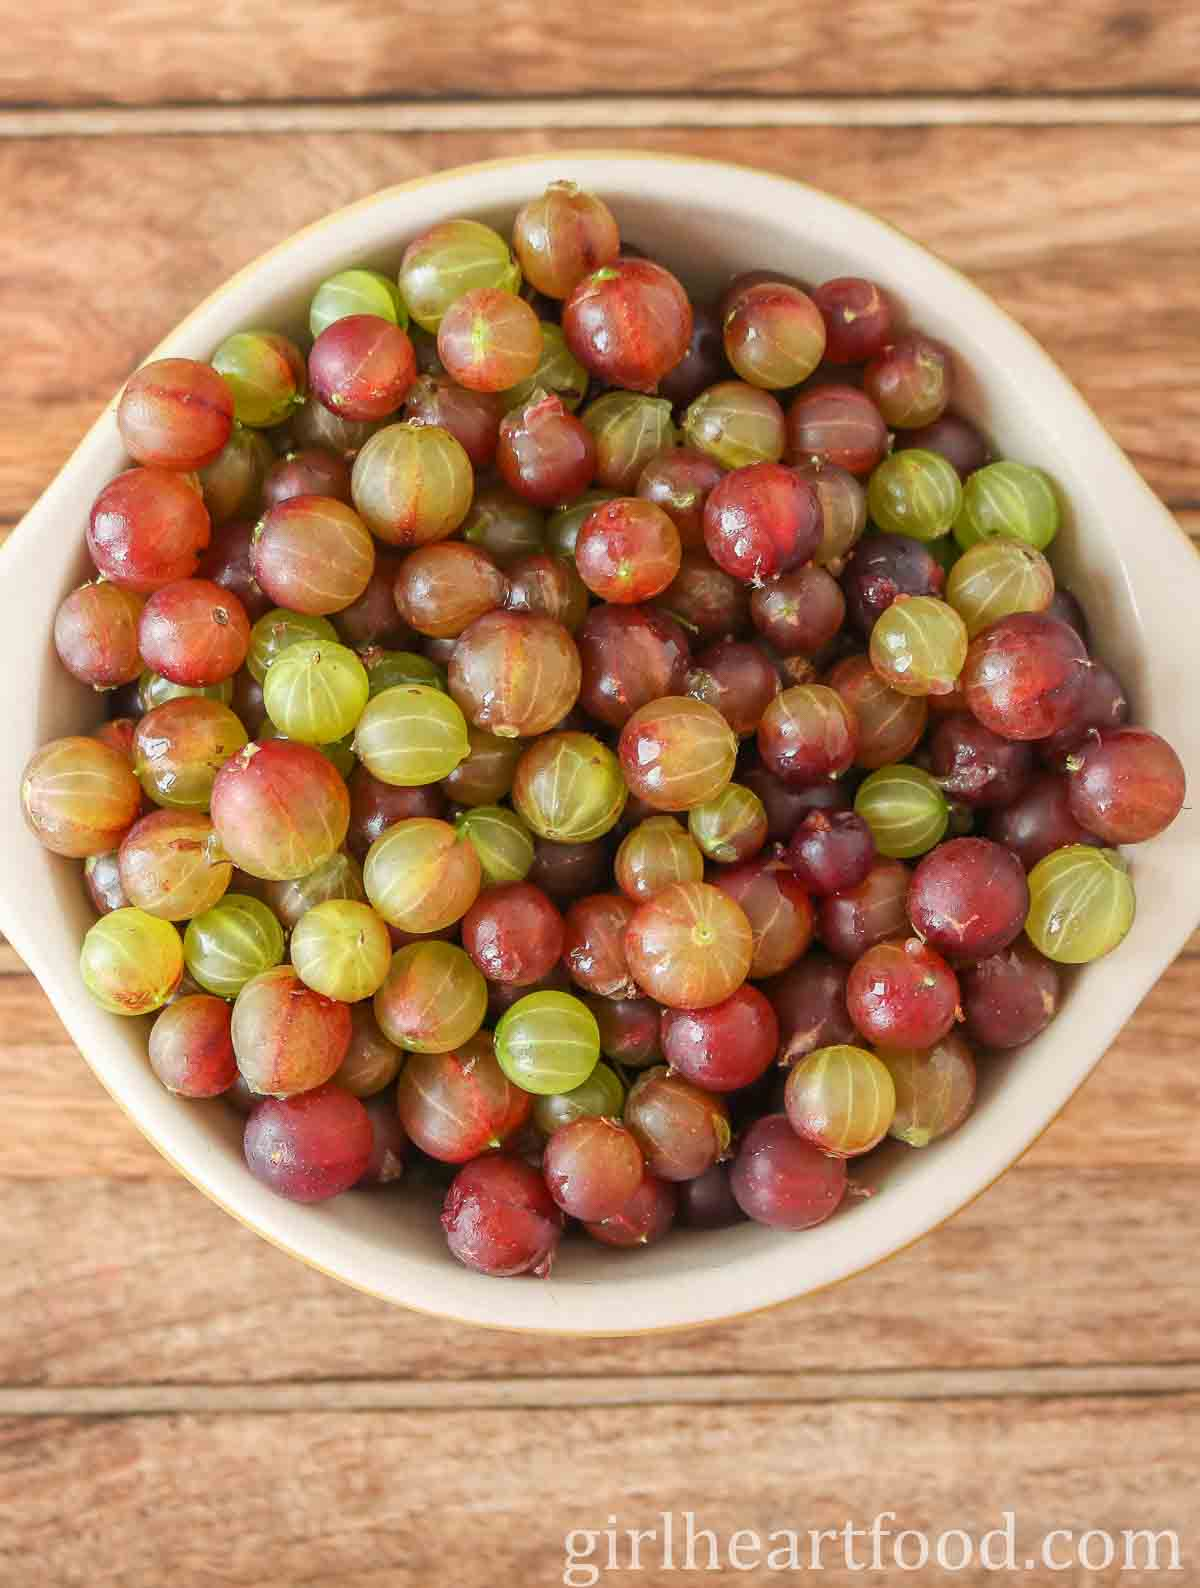 Bowl of fresh gooseberries.